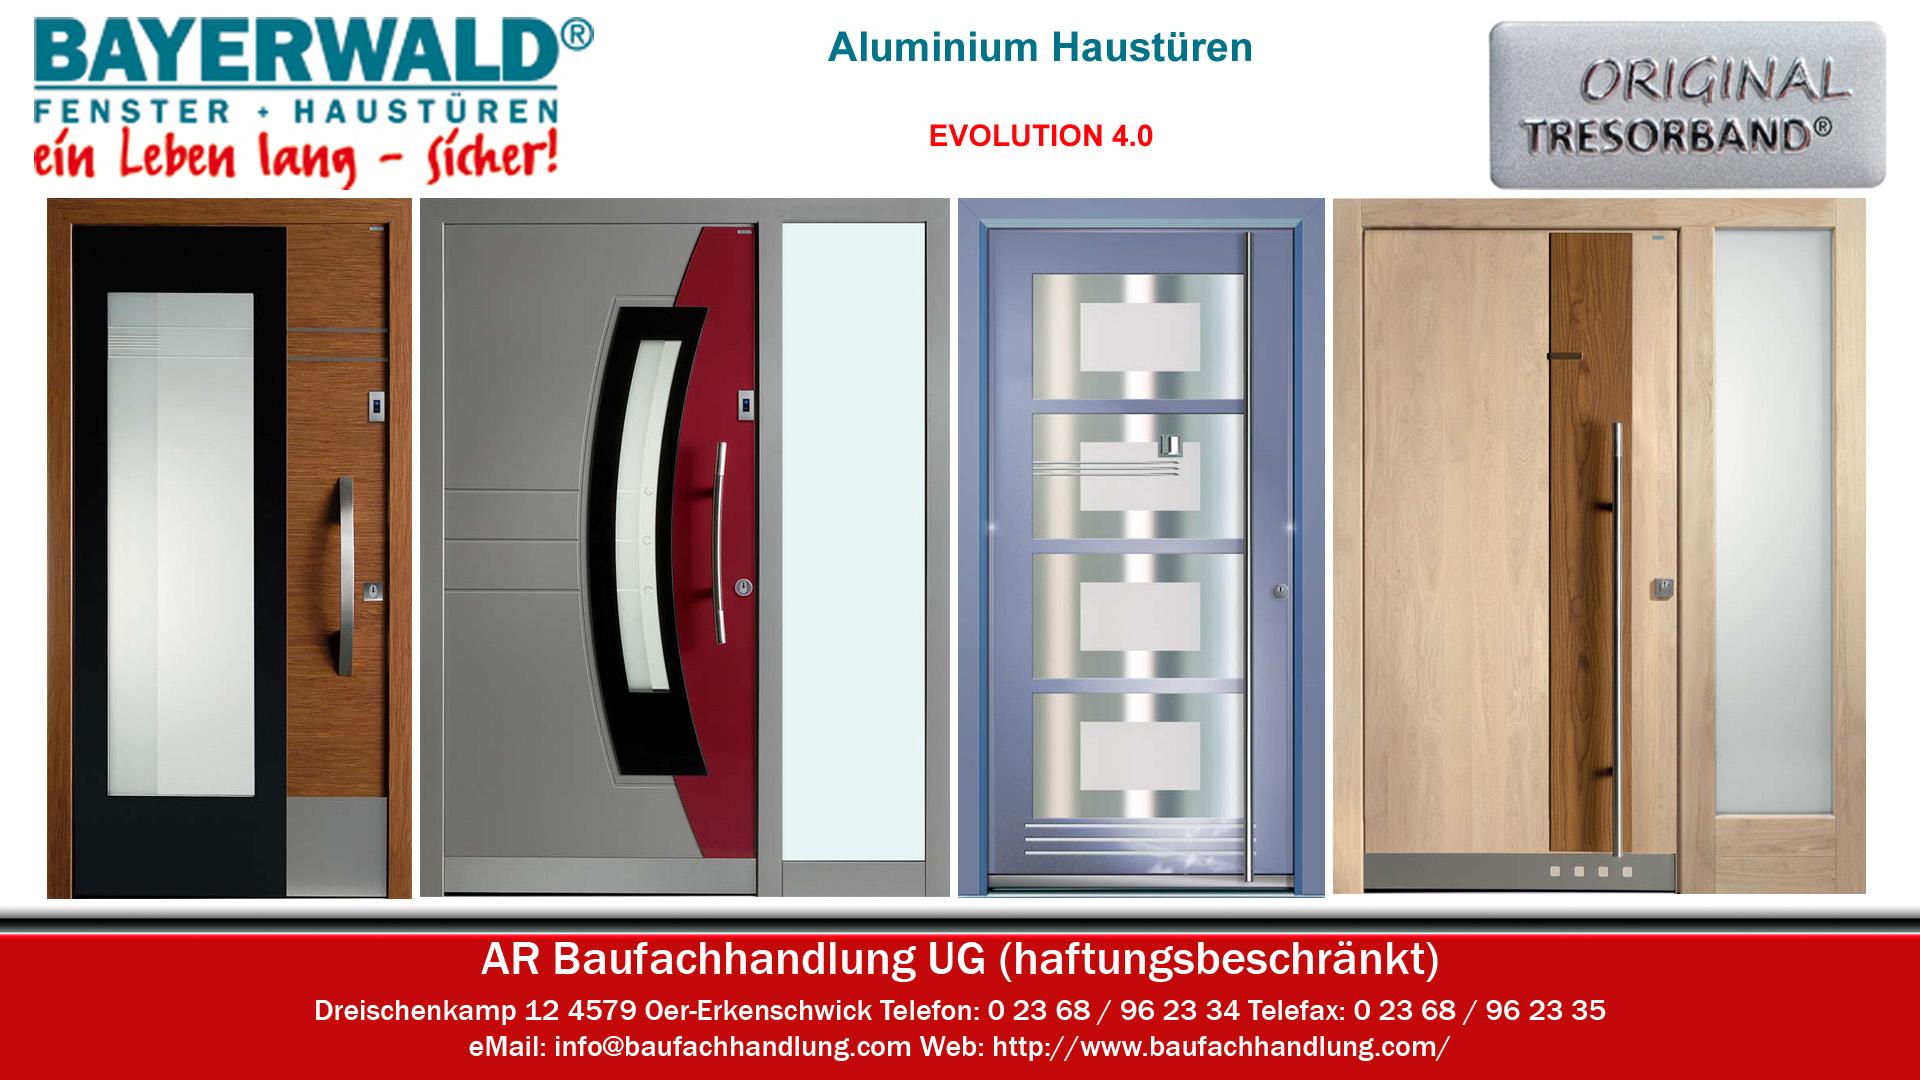 Bayerwald Haustüren bayerwald aktions aluminiumhaustüren aluminium haustüren in oer